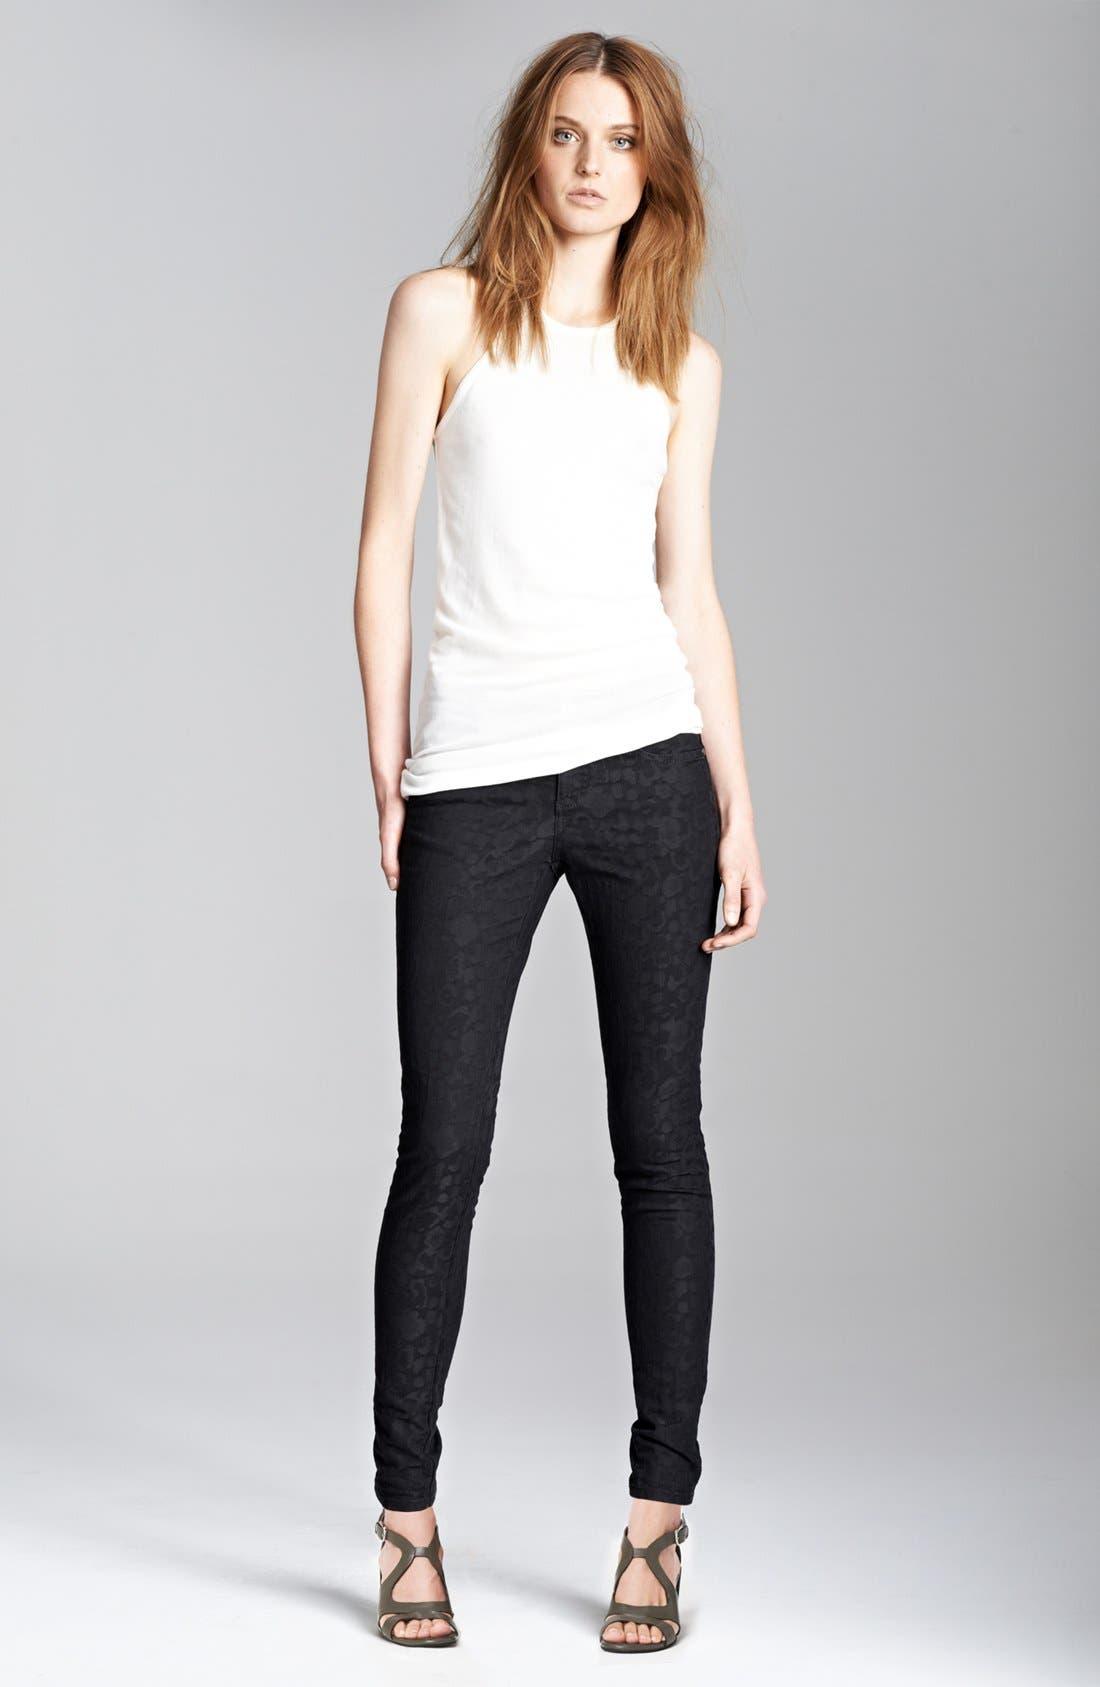 Alternate Image 1 Selected - J Brand Ready-To-Wear Camisole & Stella McCartney Skinny Jeans